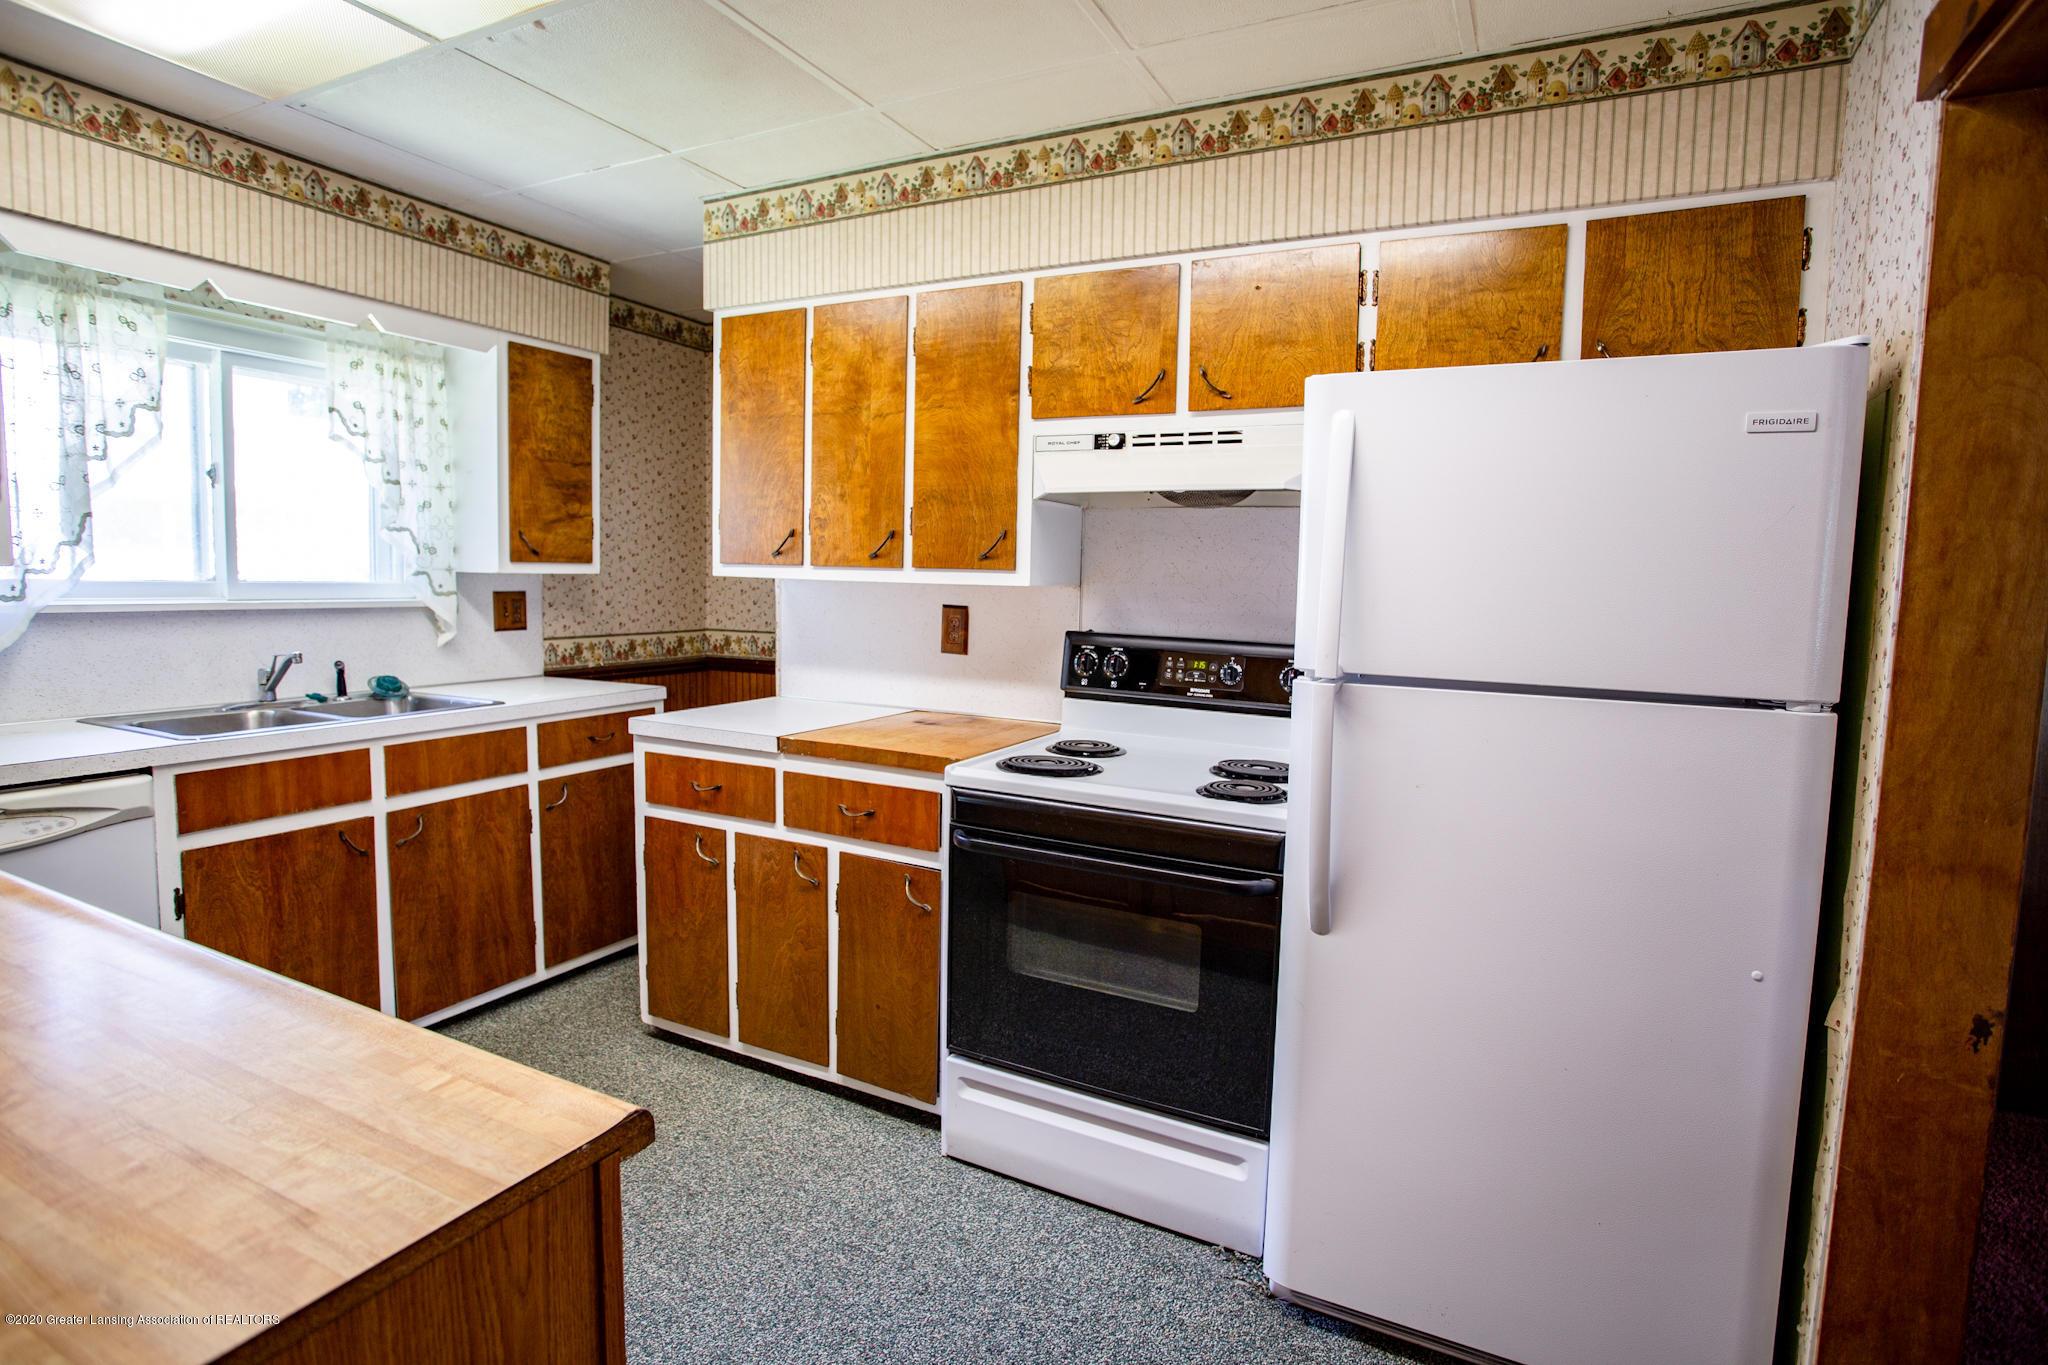 223 W Quincy St - 223 W. Quincy Kitchen - 11